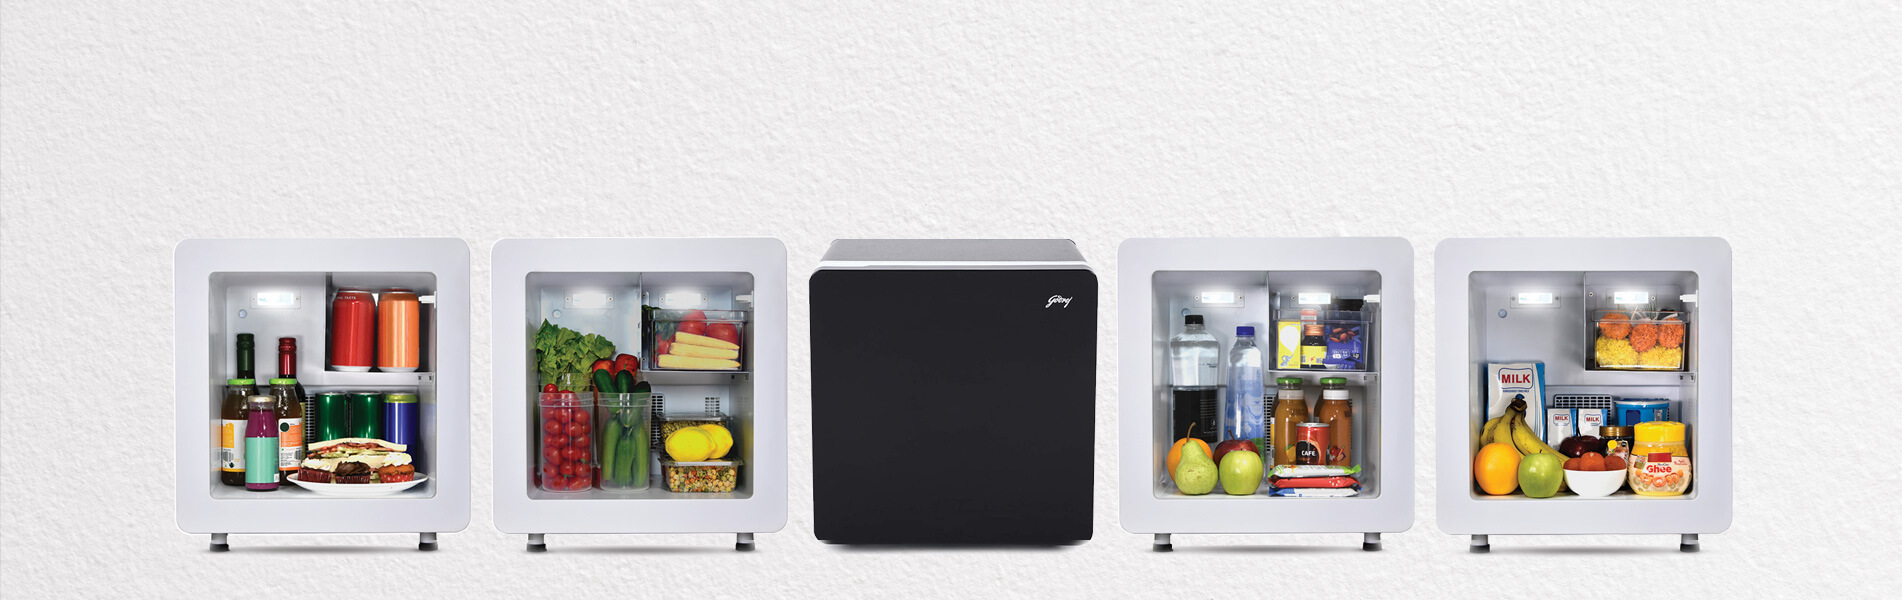 Personal Food & Beverage Cooler